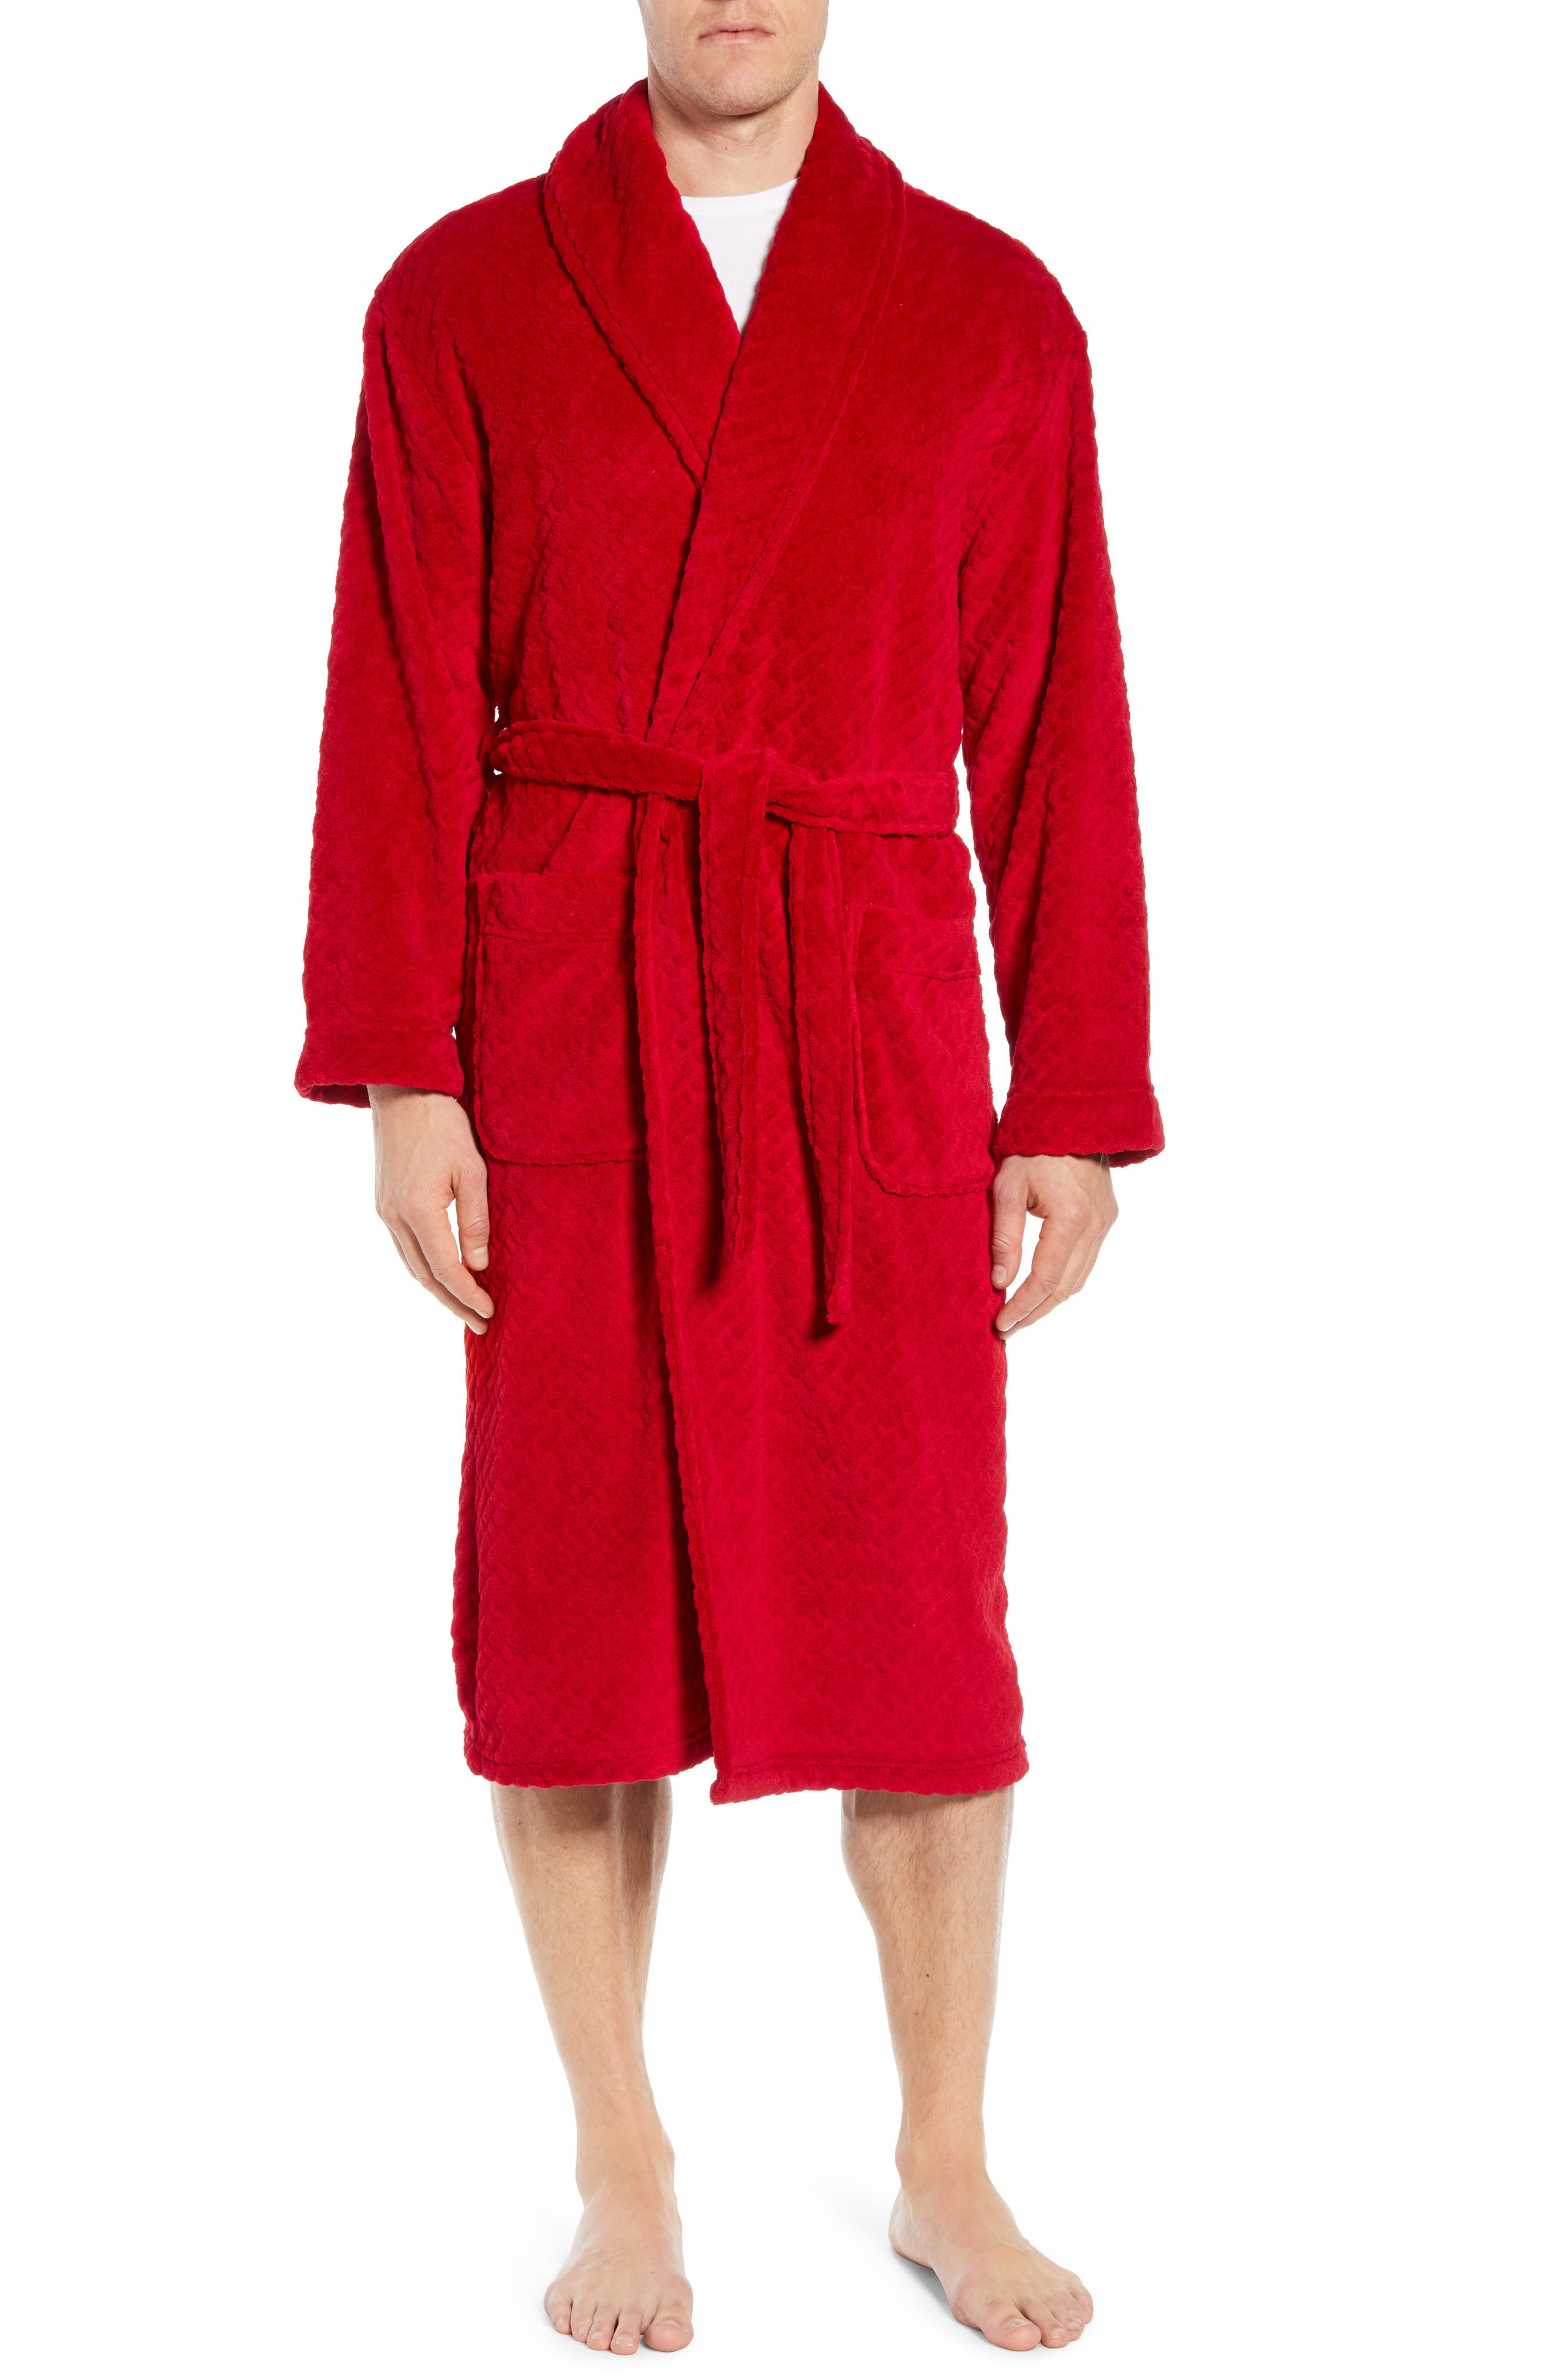 MAJESTIC INTERNATIONAL, Fireside Fleece Robe, Main thumbnail 1, color, RED RIBBON